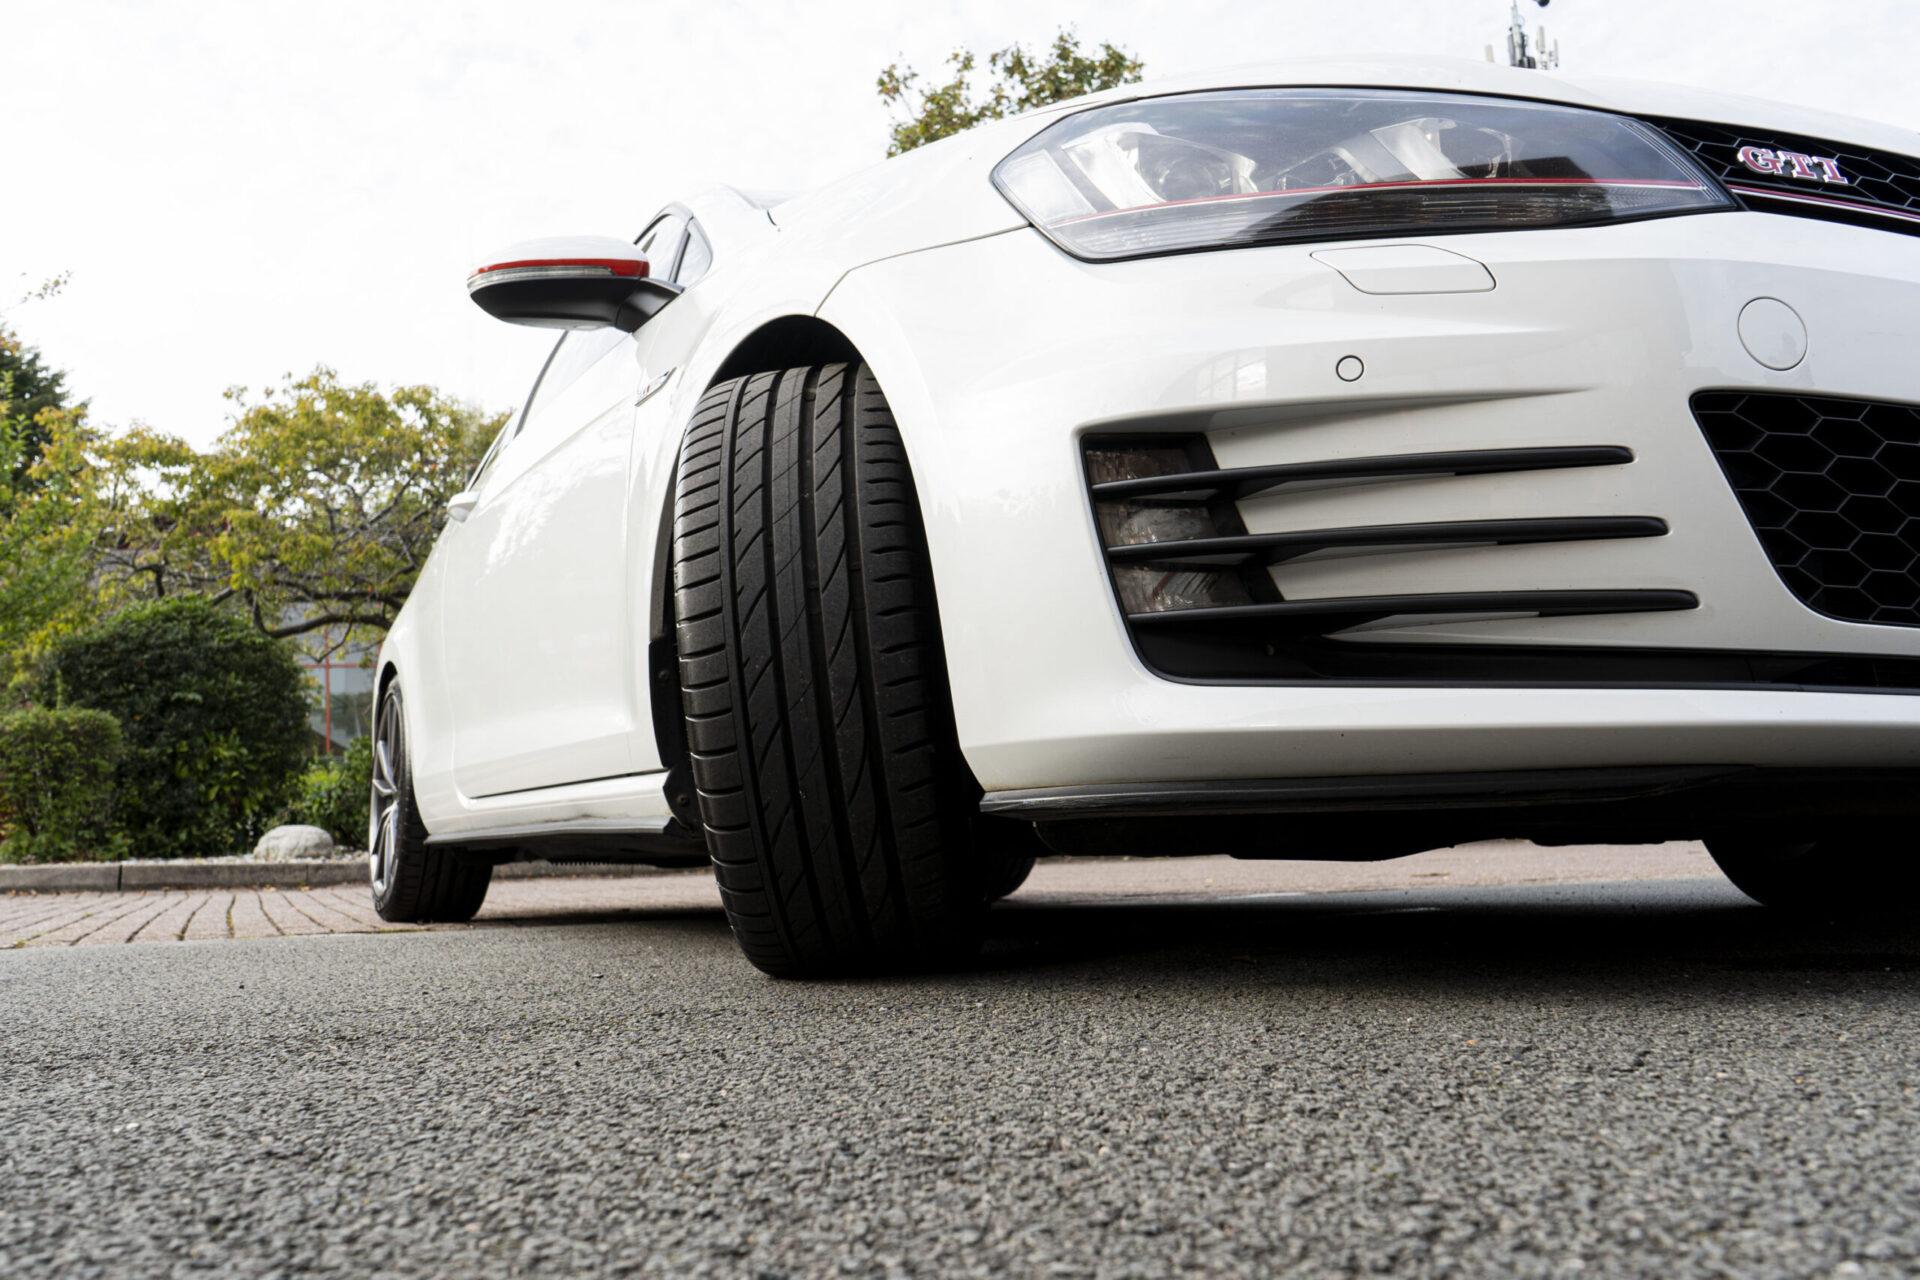 VS5 on a VW